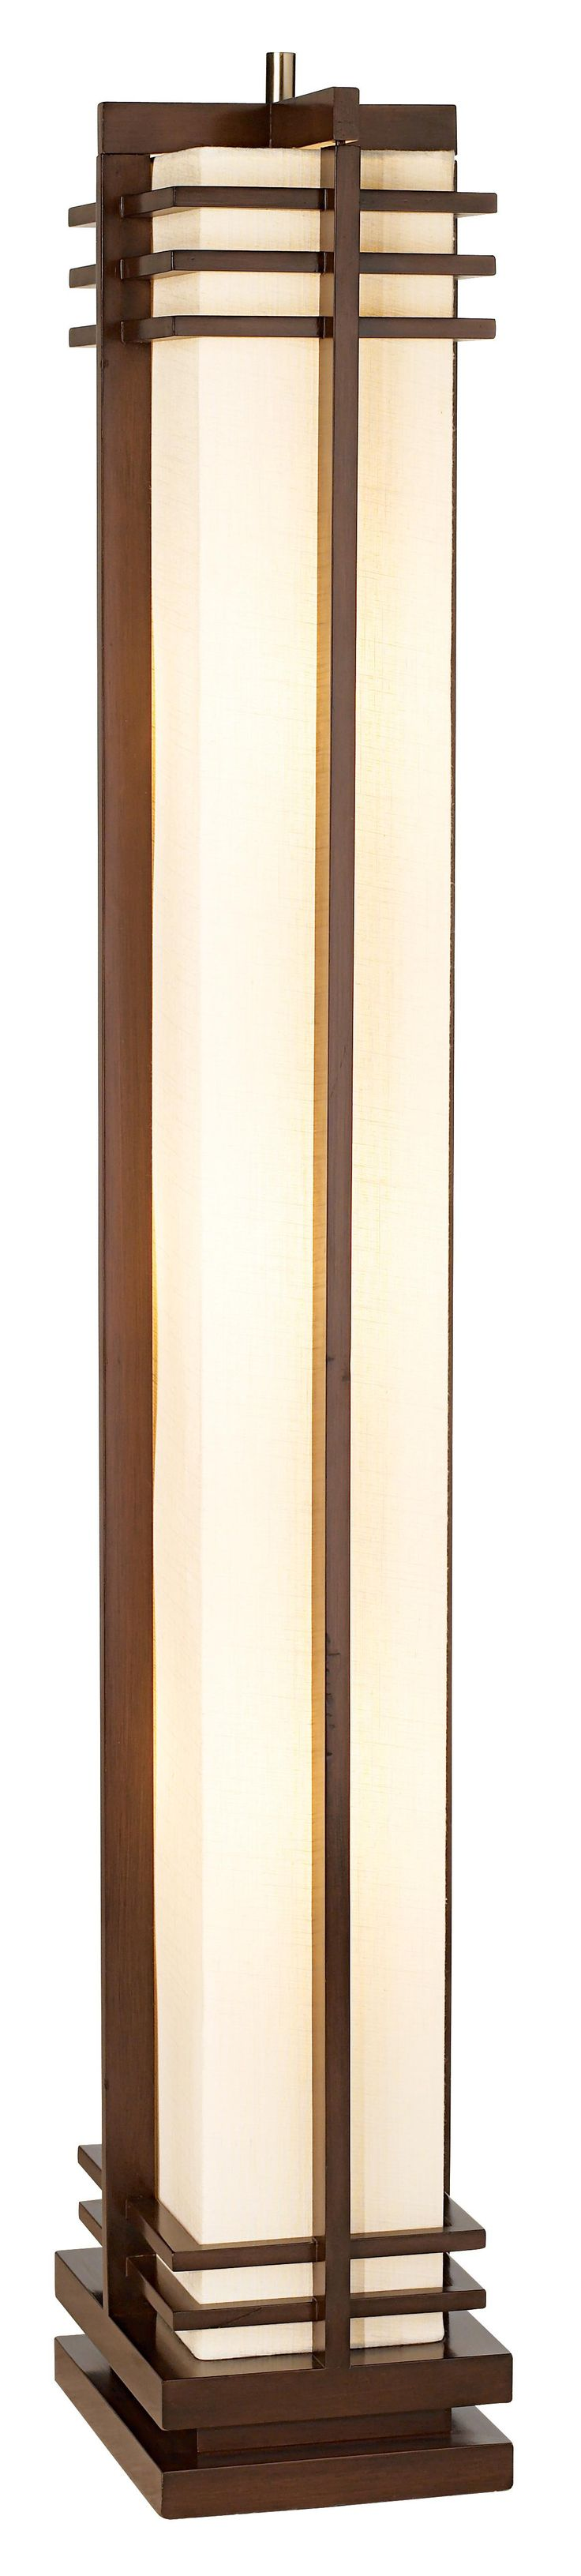 1000 ideas about designer floor lamps on pinterest Possini euro design deco style walnut column floor lamp